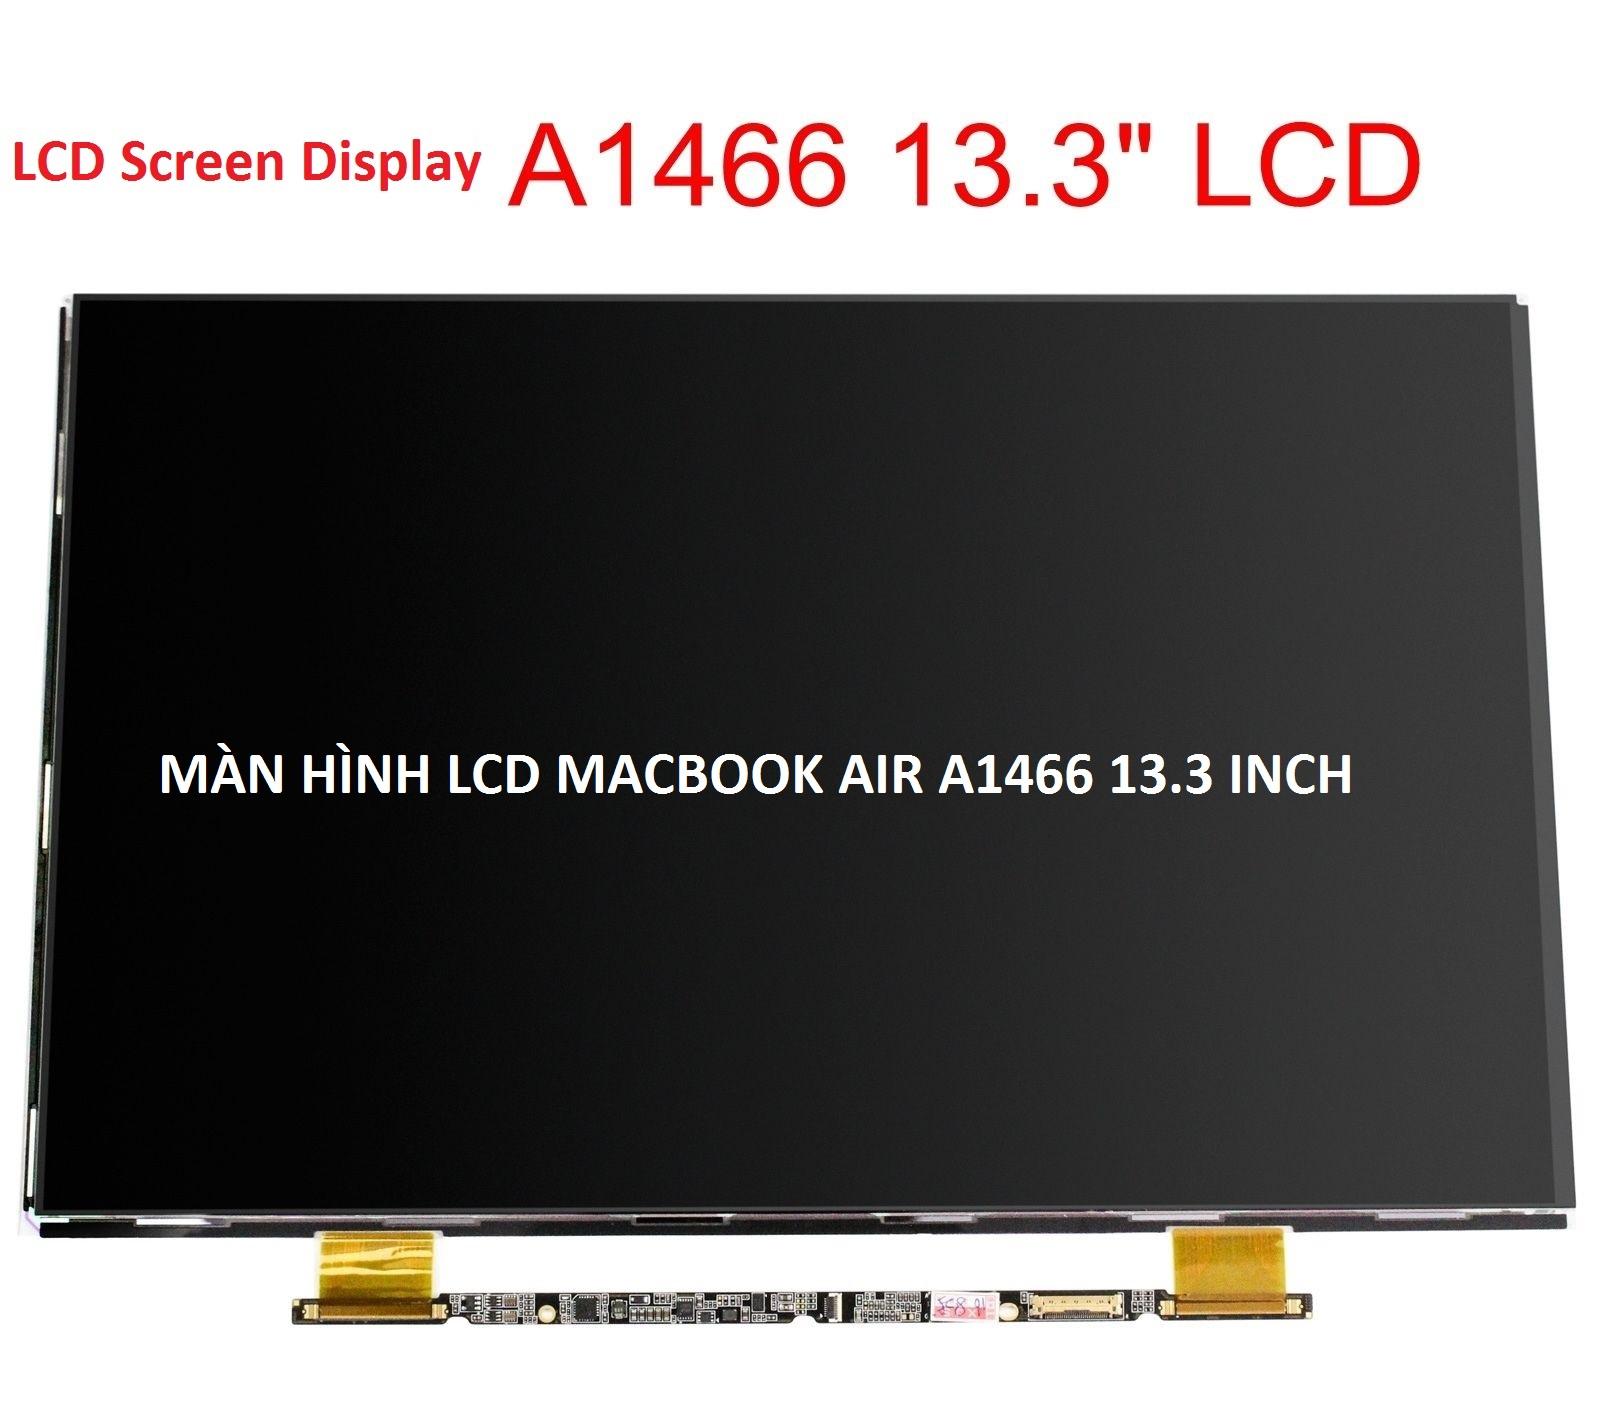 Thay màn hình Macbook Air A1466 13.3 inch 2012 2013 2014 2015 MD628 MD231 MD846 MD760 MD760B MF068 MJVE2